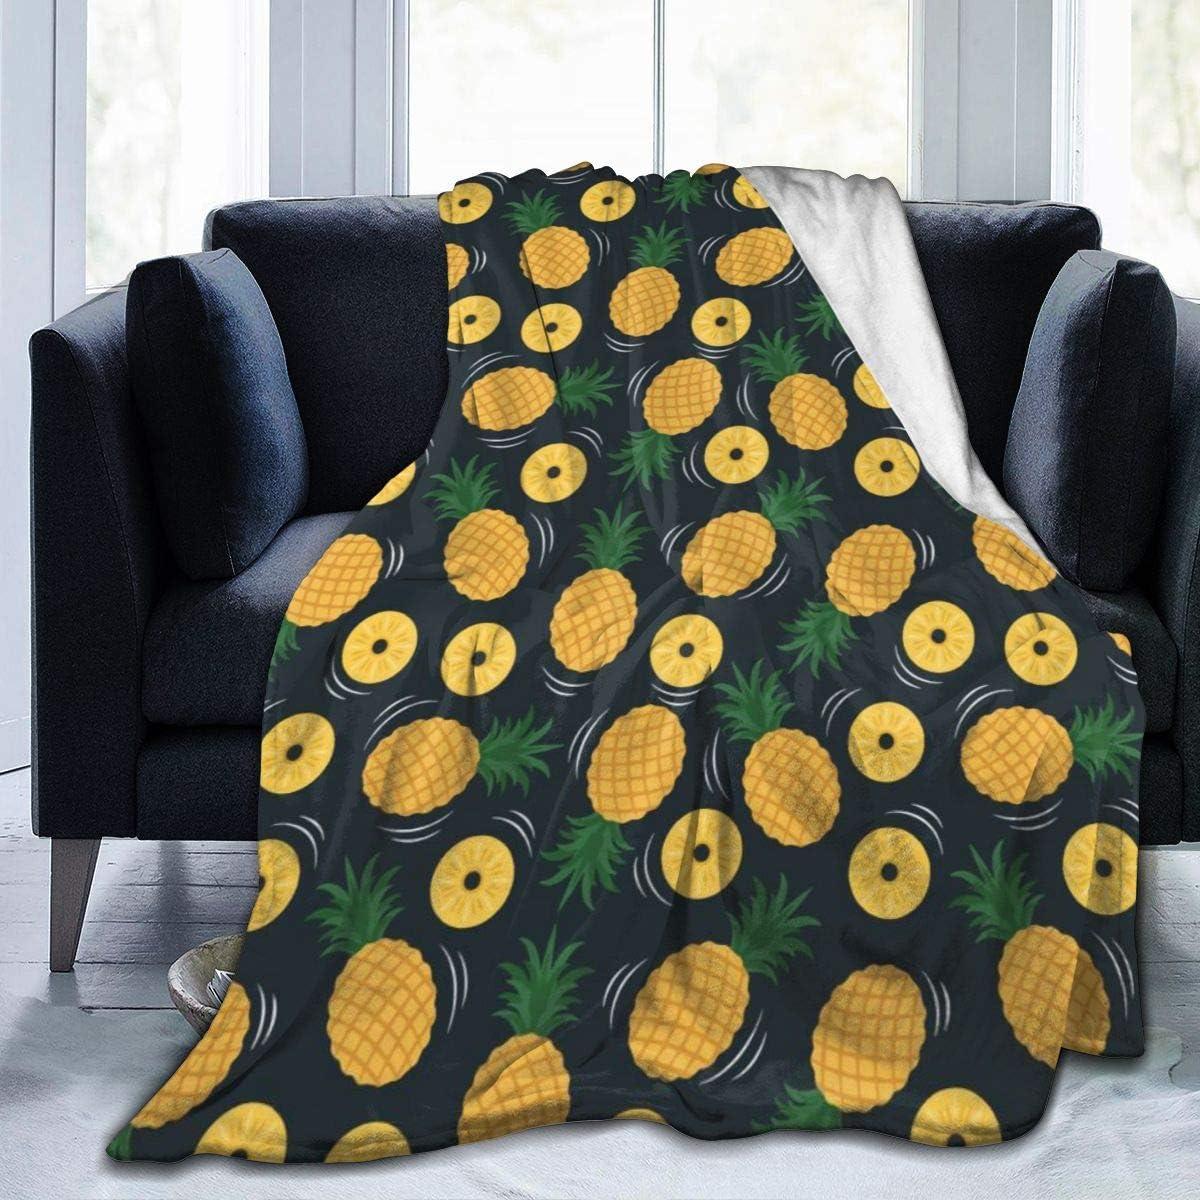 AUISS Plush Throw Velvet Blanket Yellow Pineapple Fluffy Fleece Carpet Camping Bedspreads for Women Cozy Sleep Mat Pad Flannel Cover for Winter